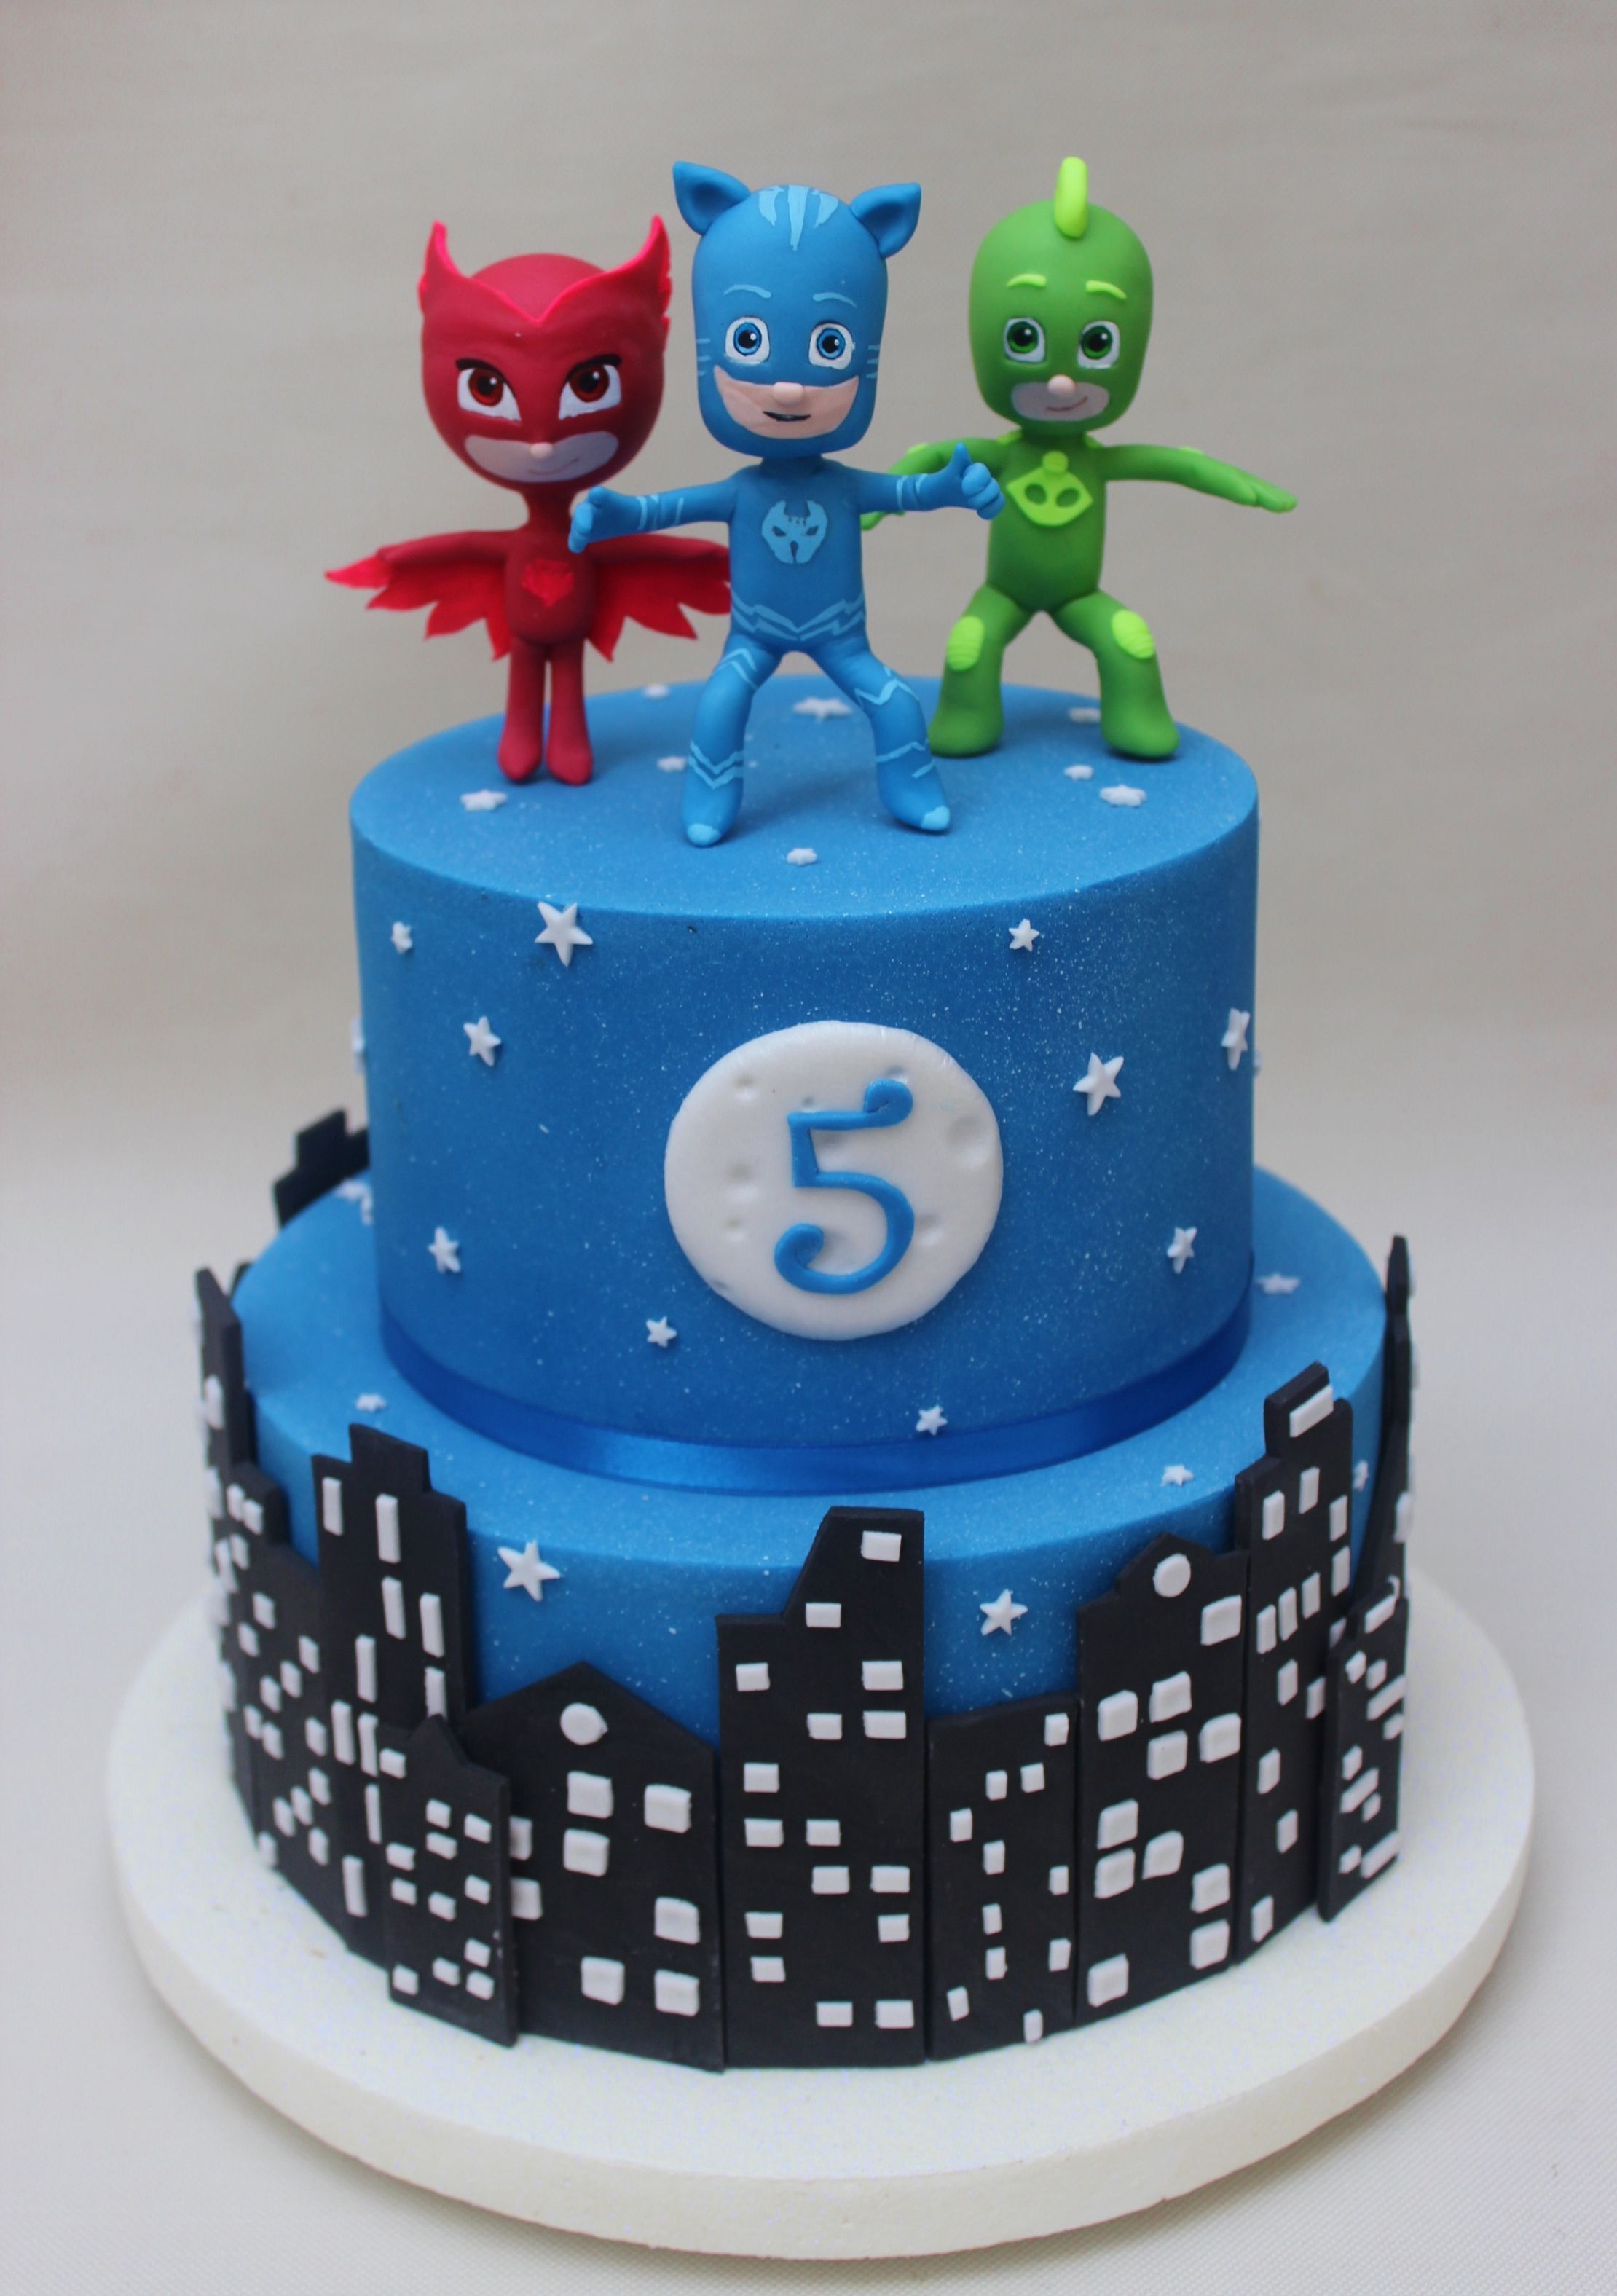 Cake Decoration J D O O : PJ Mask Cake Violeta Glace Birthdays Cakes Pinterest ...